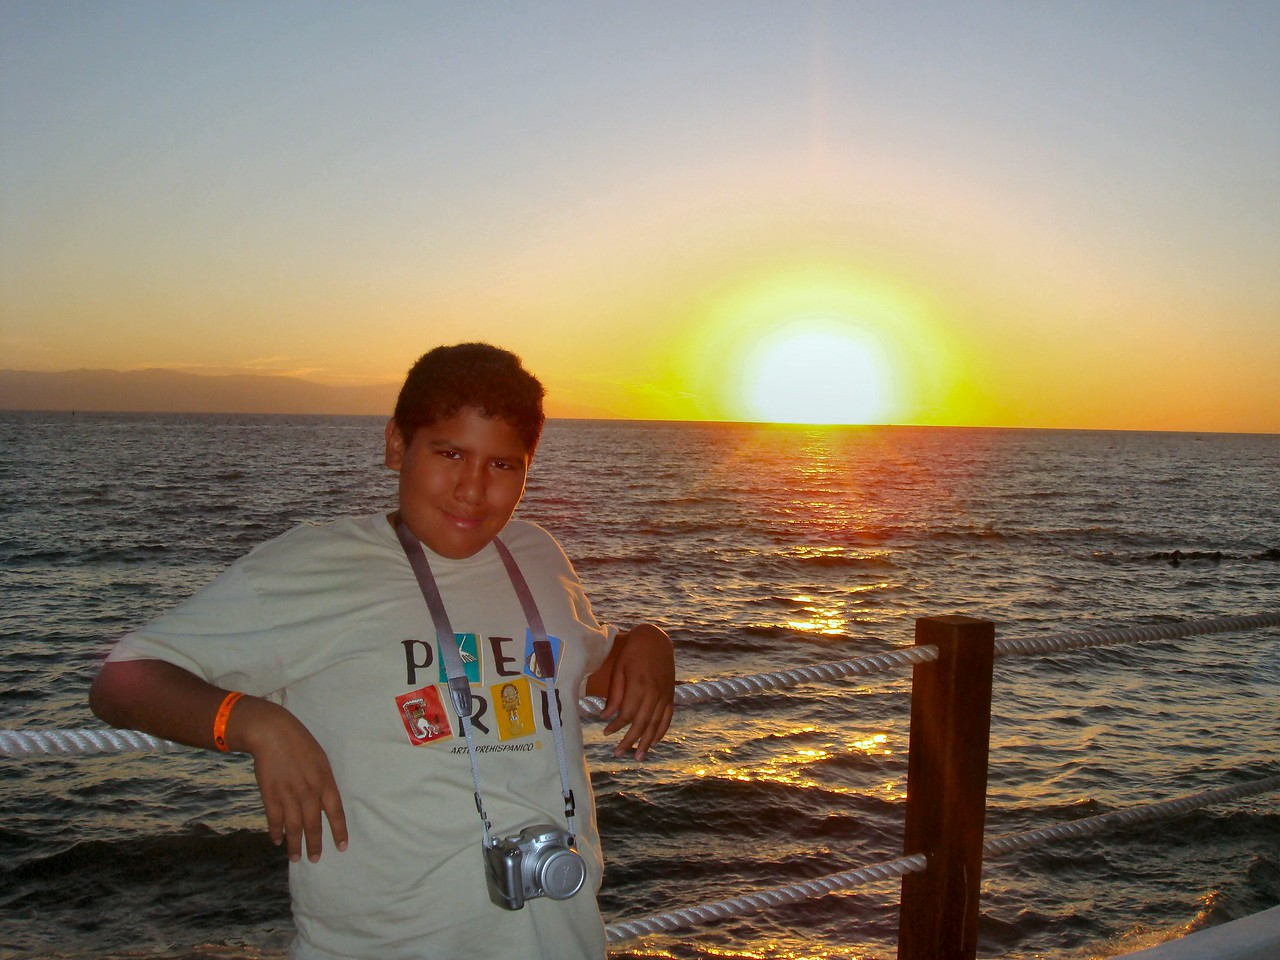 Caesar watching the sunset at the beach...<br /> <br /> Cesar mirando el sunset en la playa...